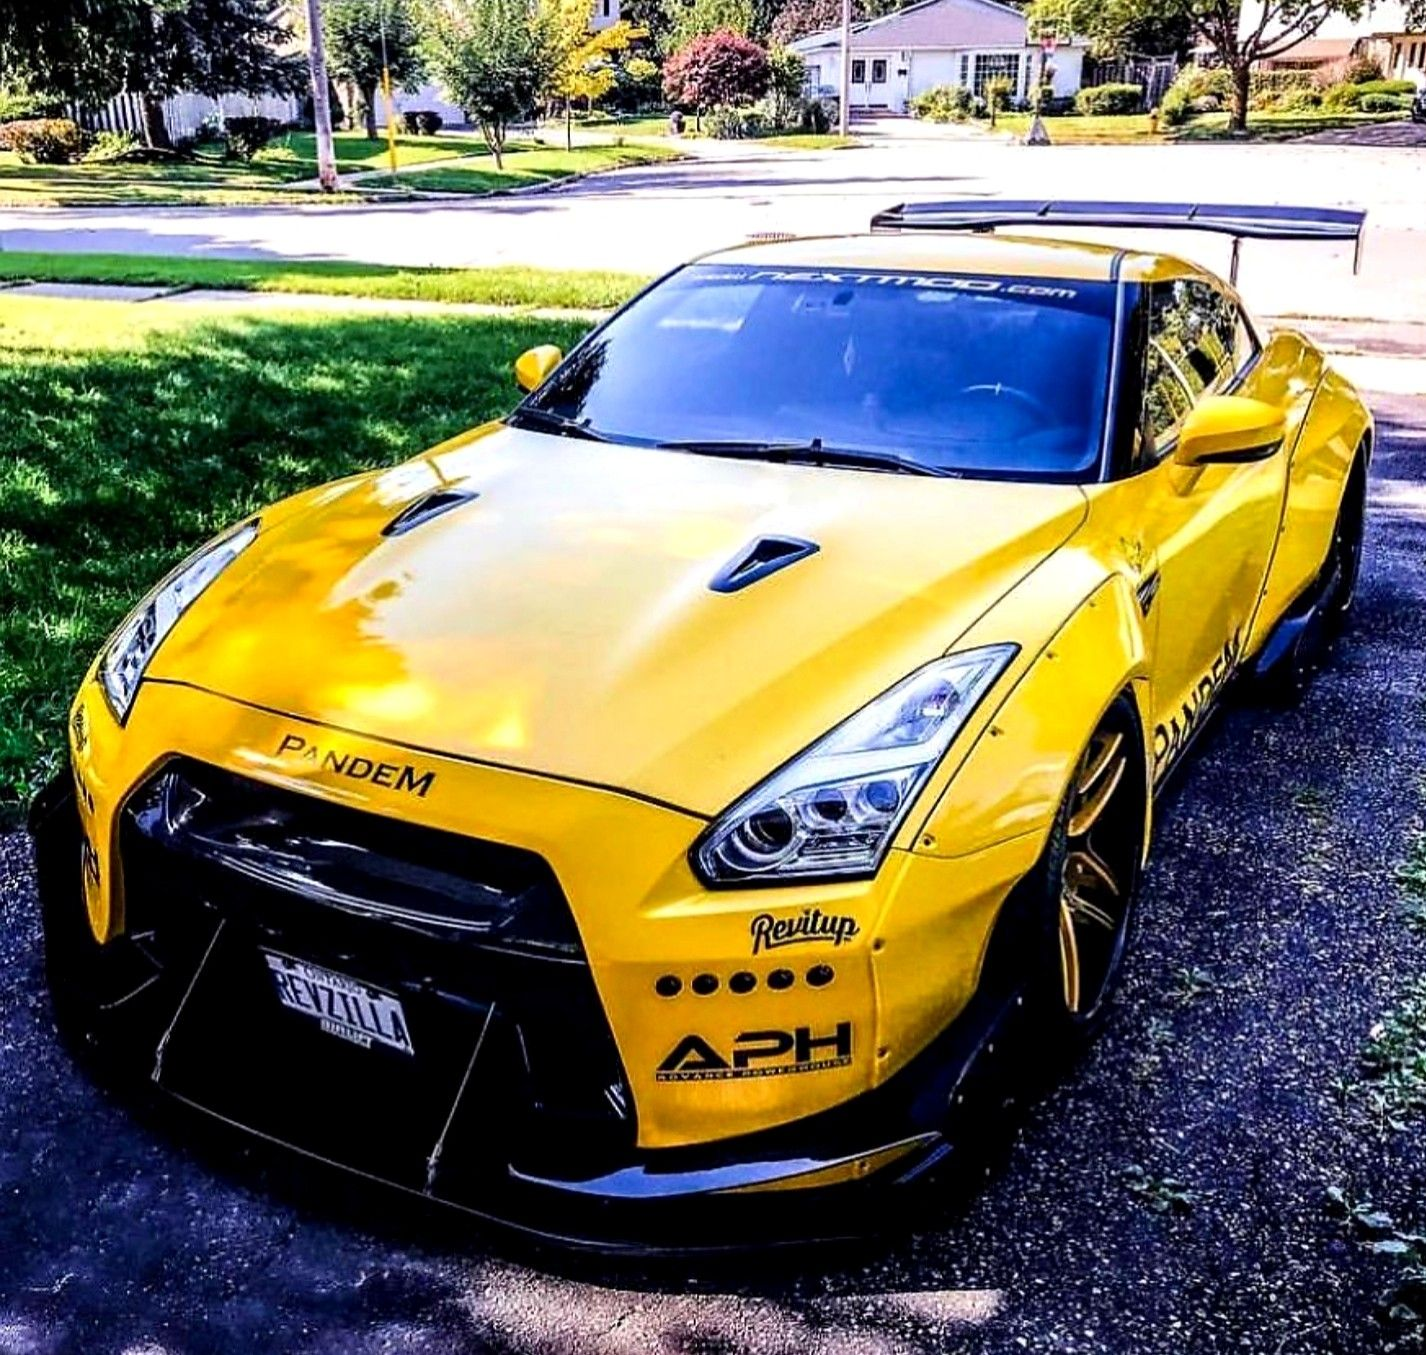 Pandem Kitted Nissan Gt R Z Litwhips Nissan Gtr R35 Nissan Gt Japan Cars Nissan gtr yellow sports car wallpaper